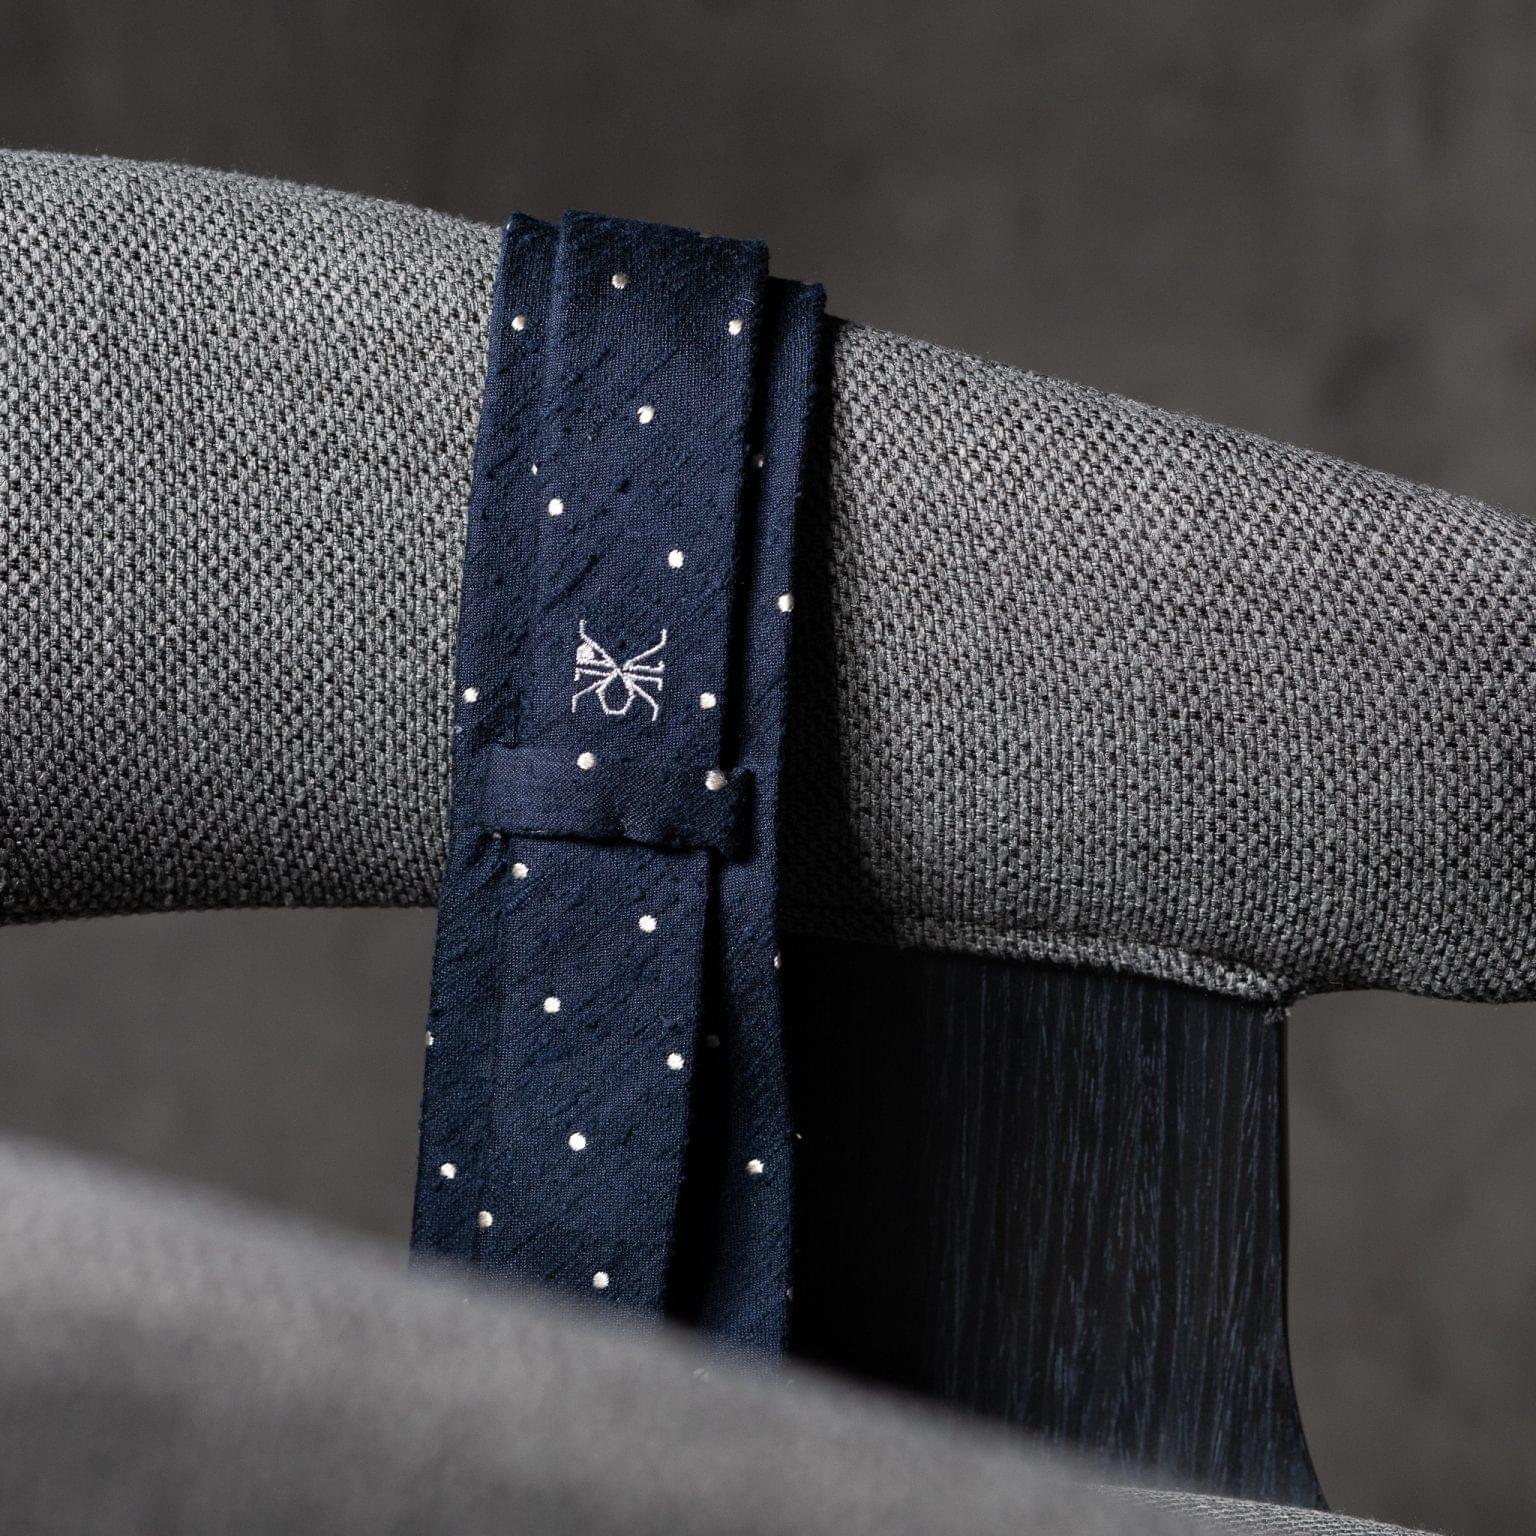 SHANTUNG-0527-Tie-Initials-Corbata-Iniciales-The-Seelk-4